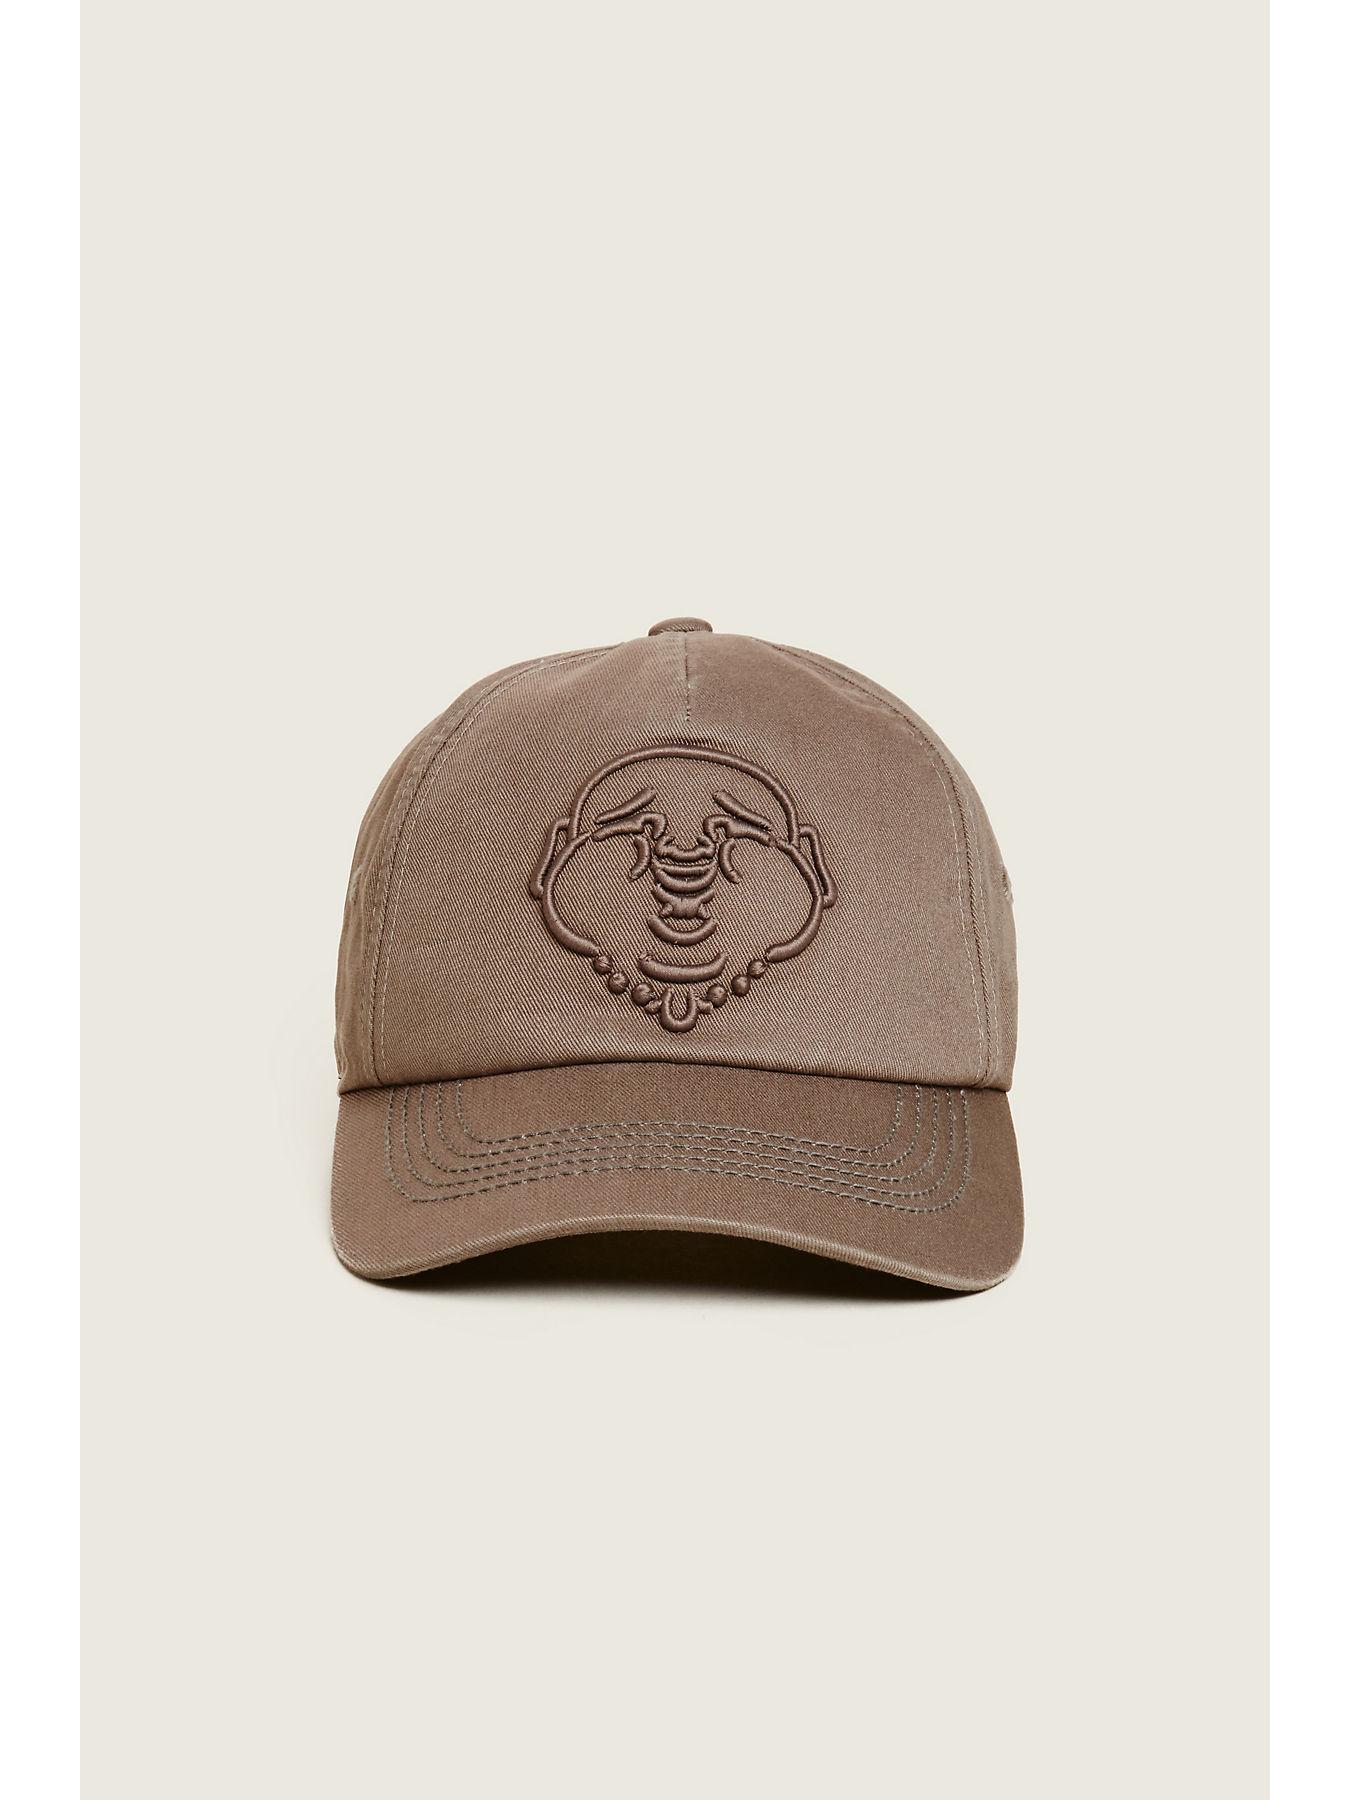 1d99e8f9 3D BUDDHA BASEBALL CAP; 3D BUDDHA BASEBALL CAP ...